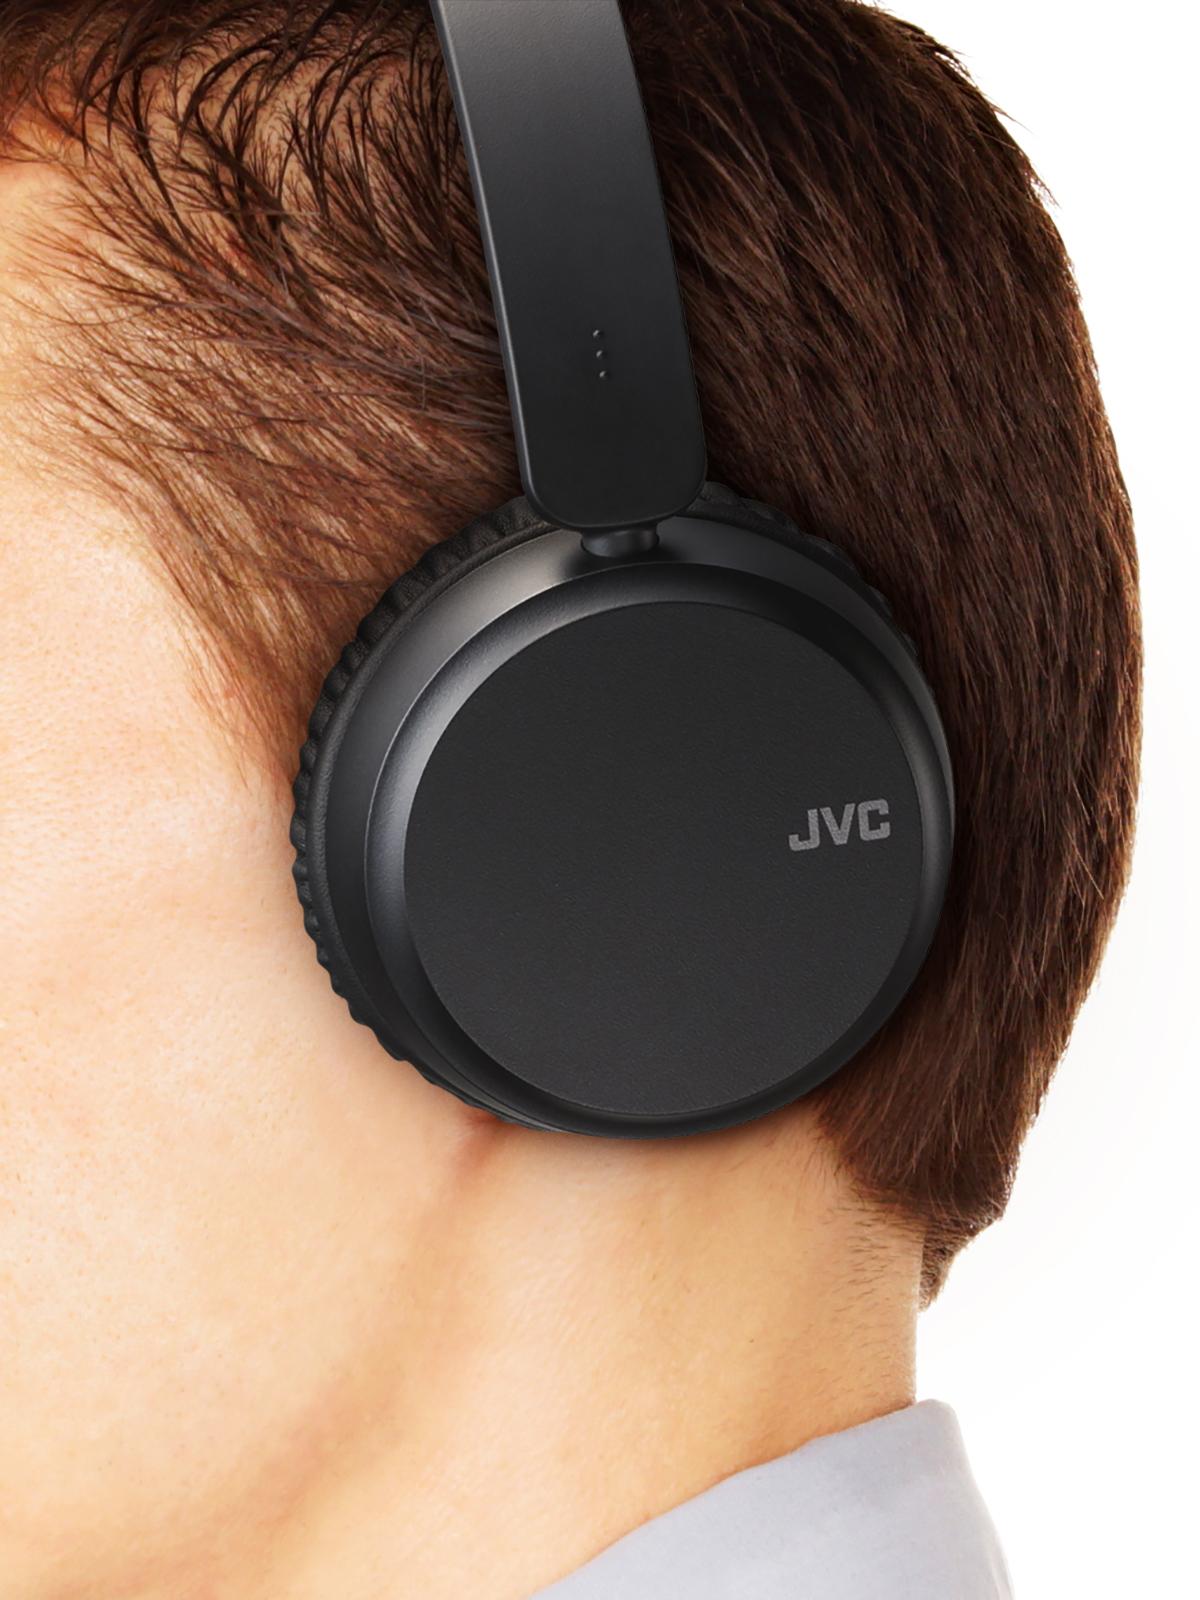 JVC lancia 6 nuove cuffie in-ear, sovraurali, cablate e wireless 1